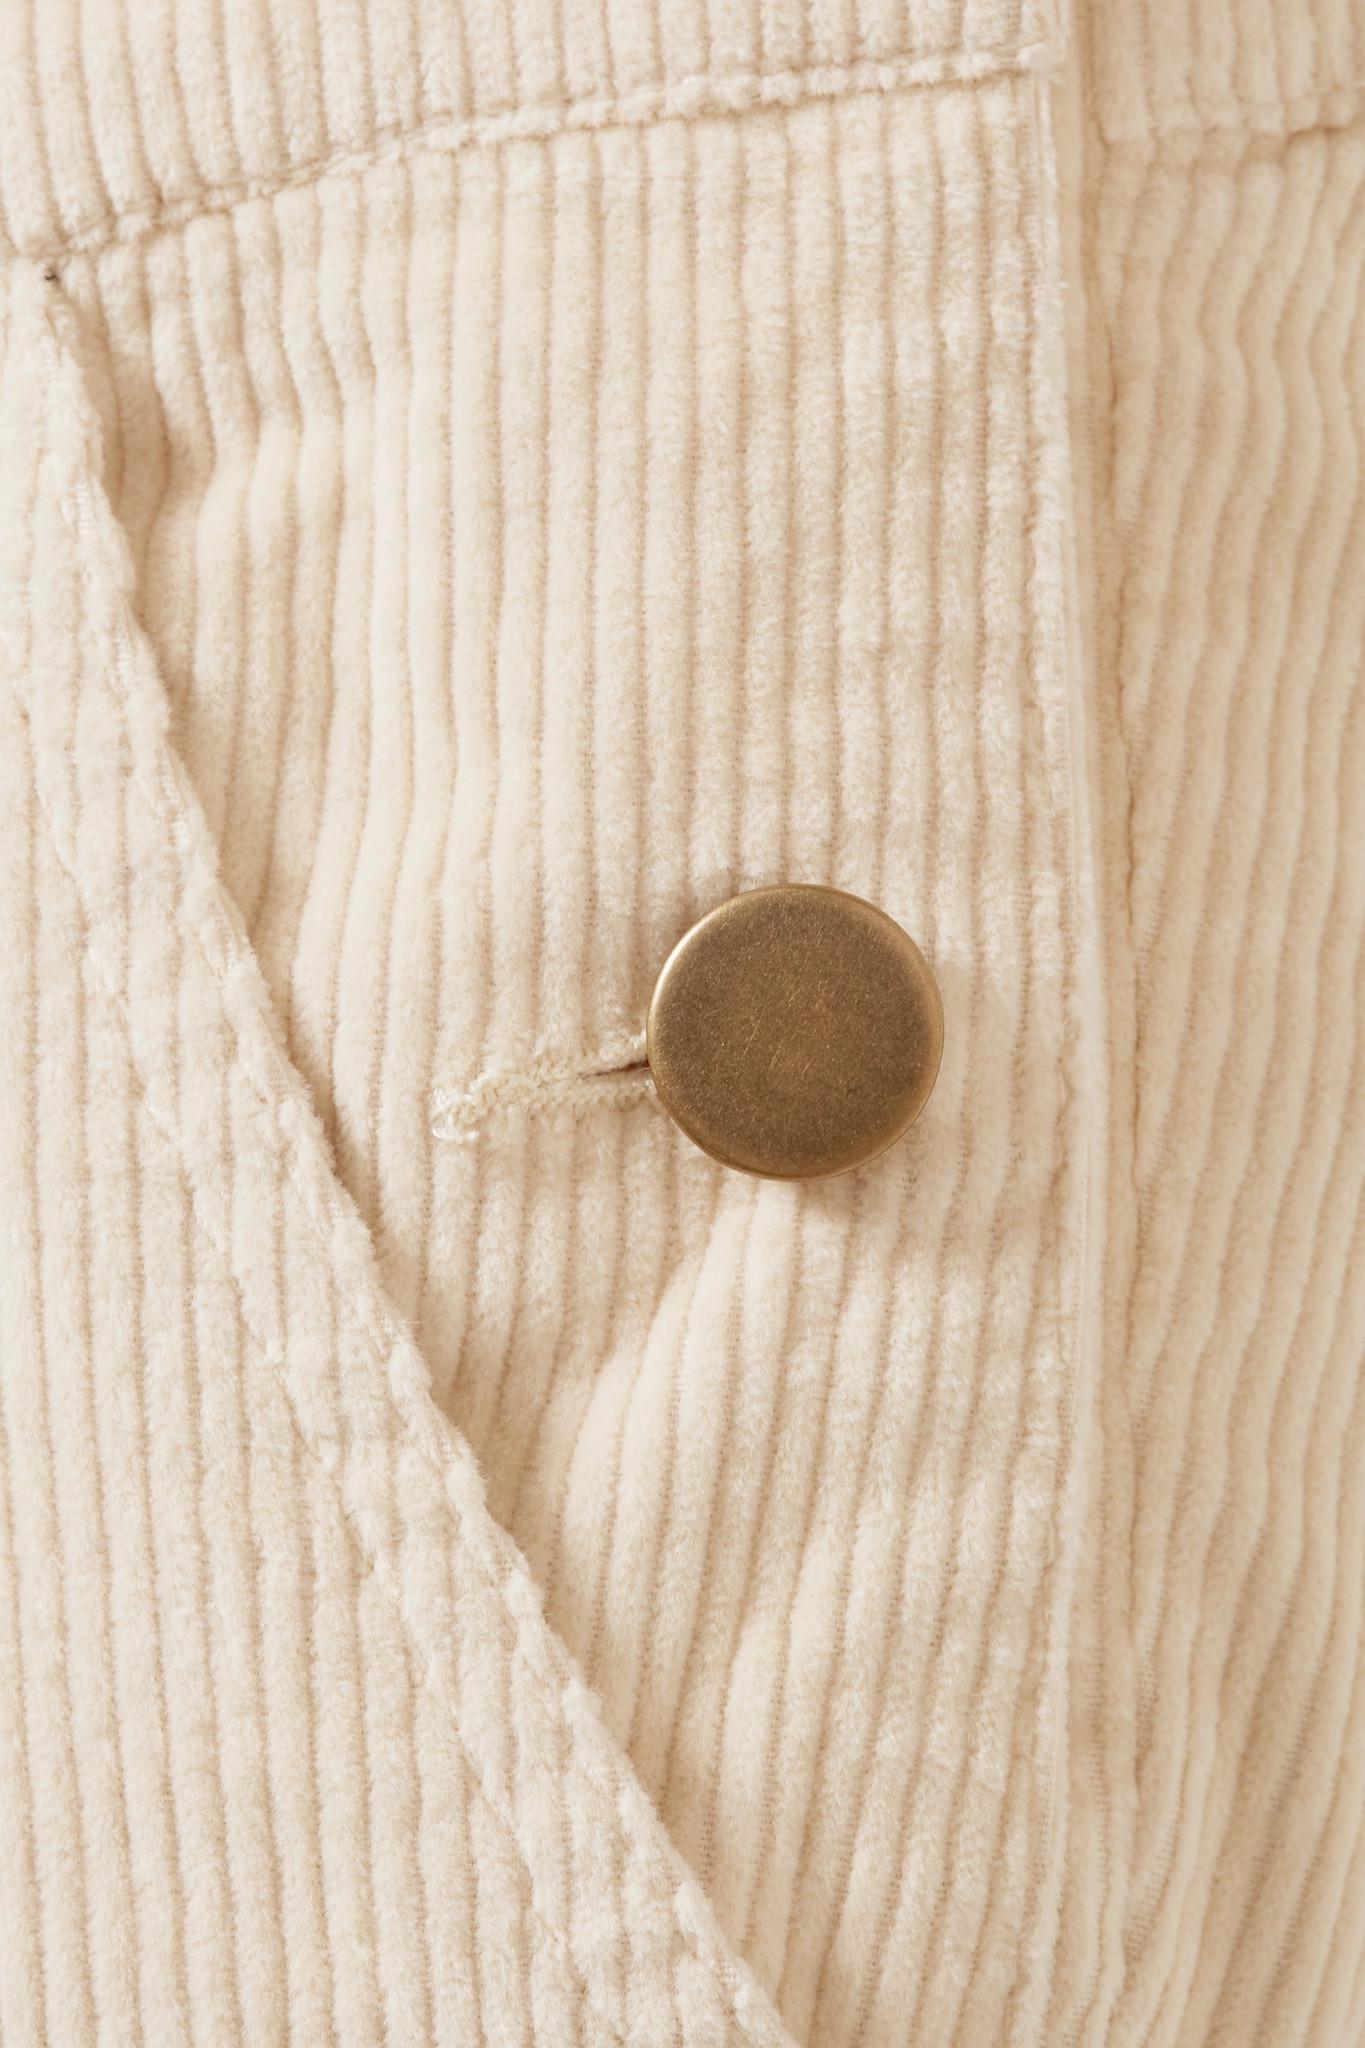 e1309f43d960 HATCH - White The Cord Cotton-blend Corduroy Overalls - Lyst. View  fullscreen